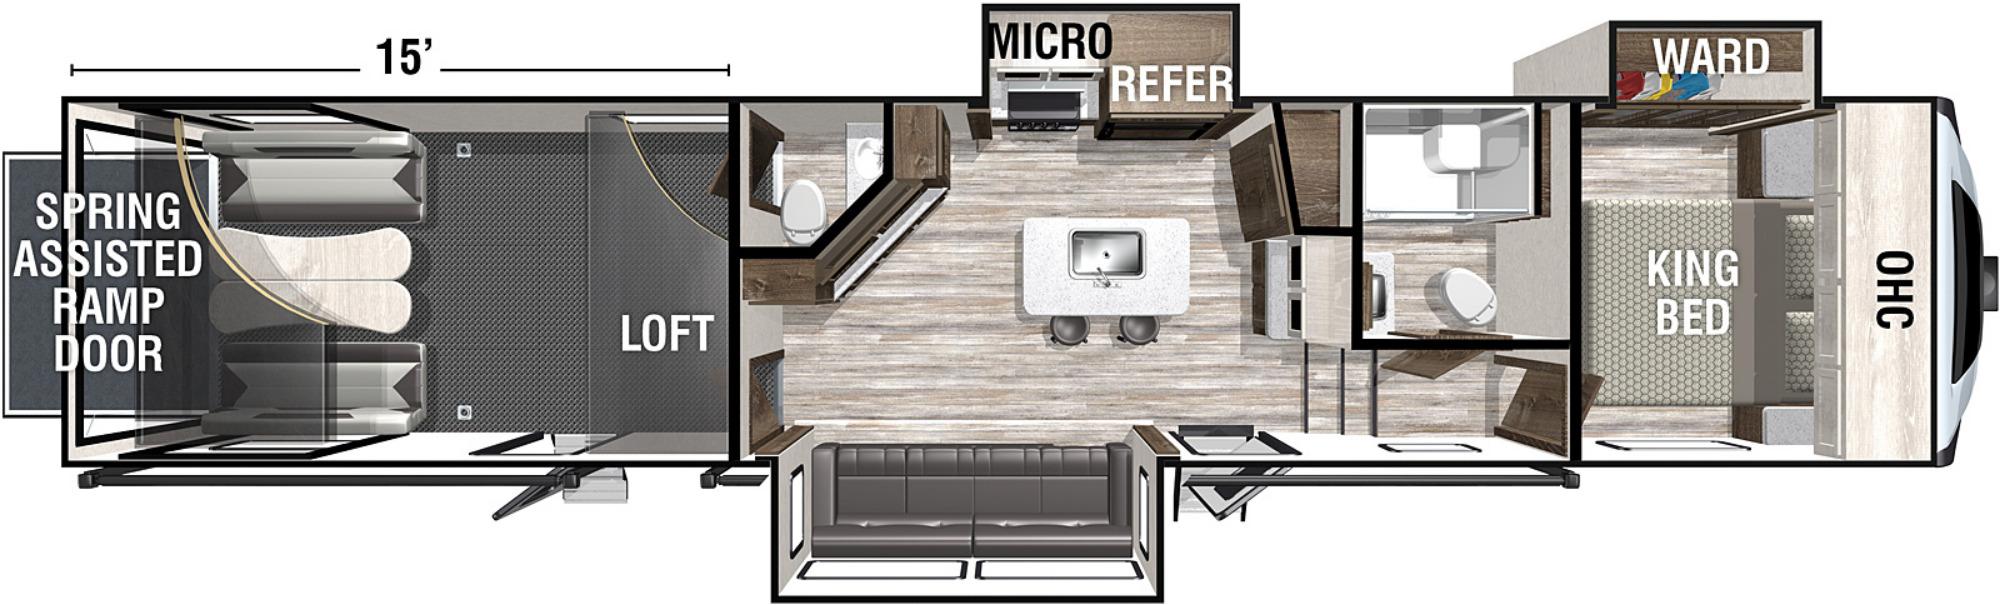 View Floor Plan for 2021 FOREST RIVER XLR NITRO 35DK5